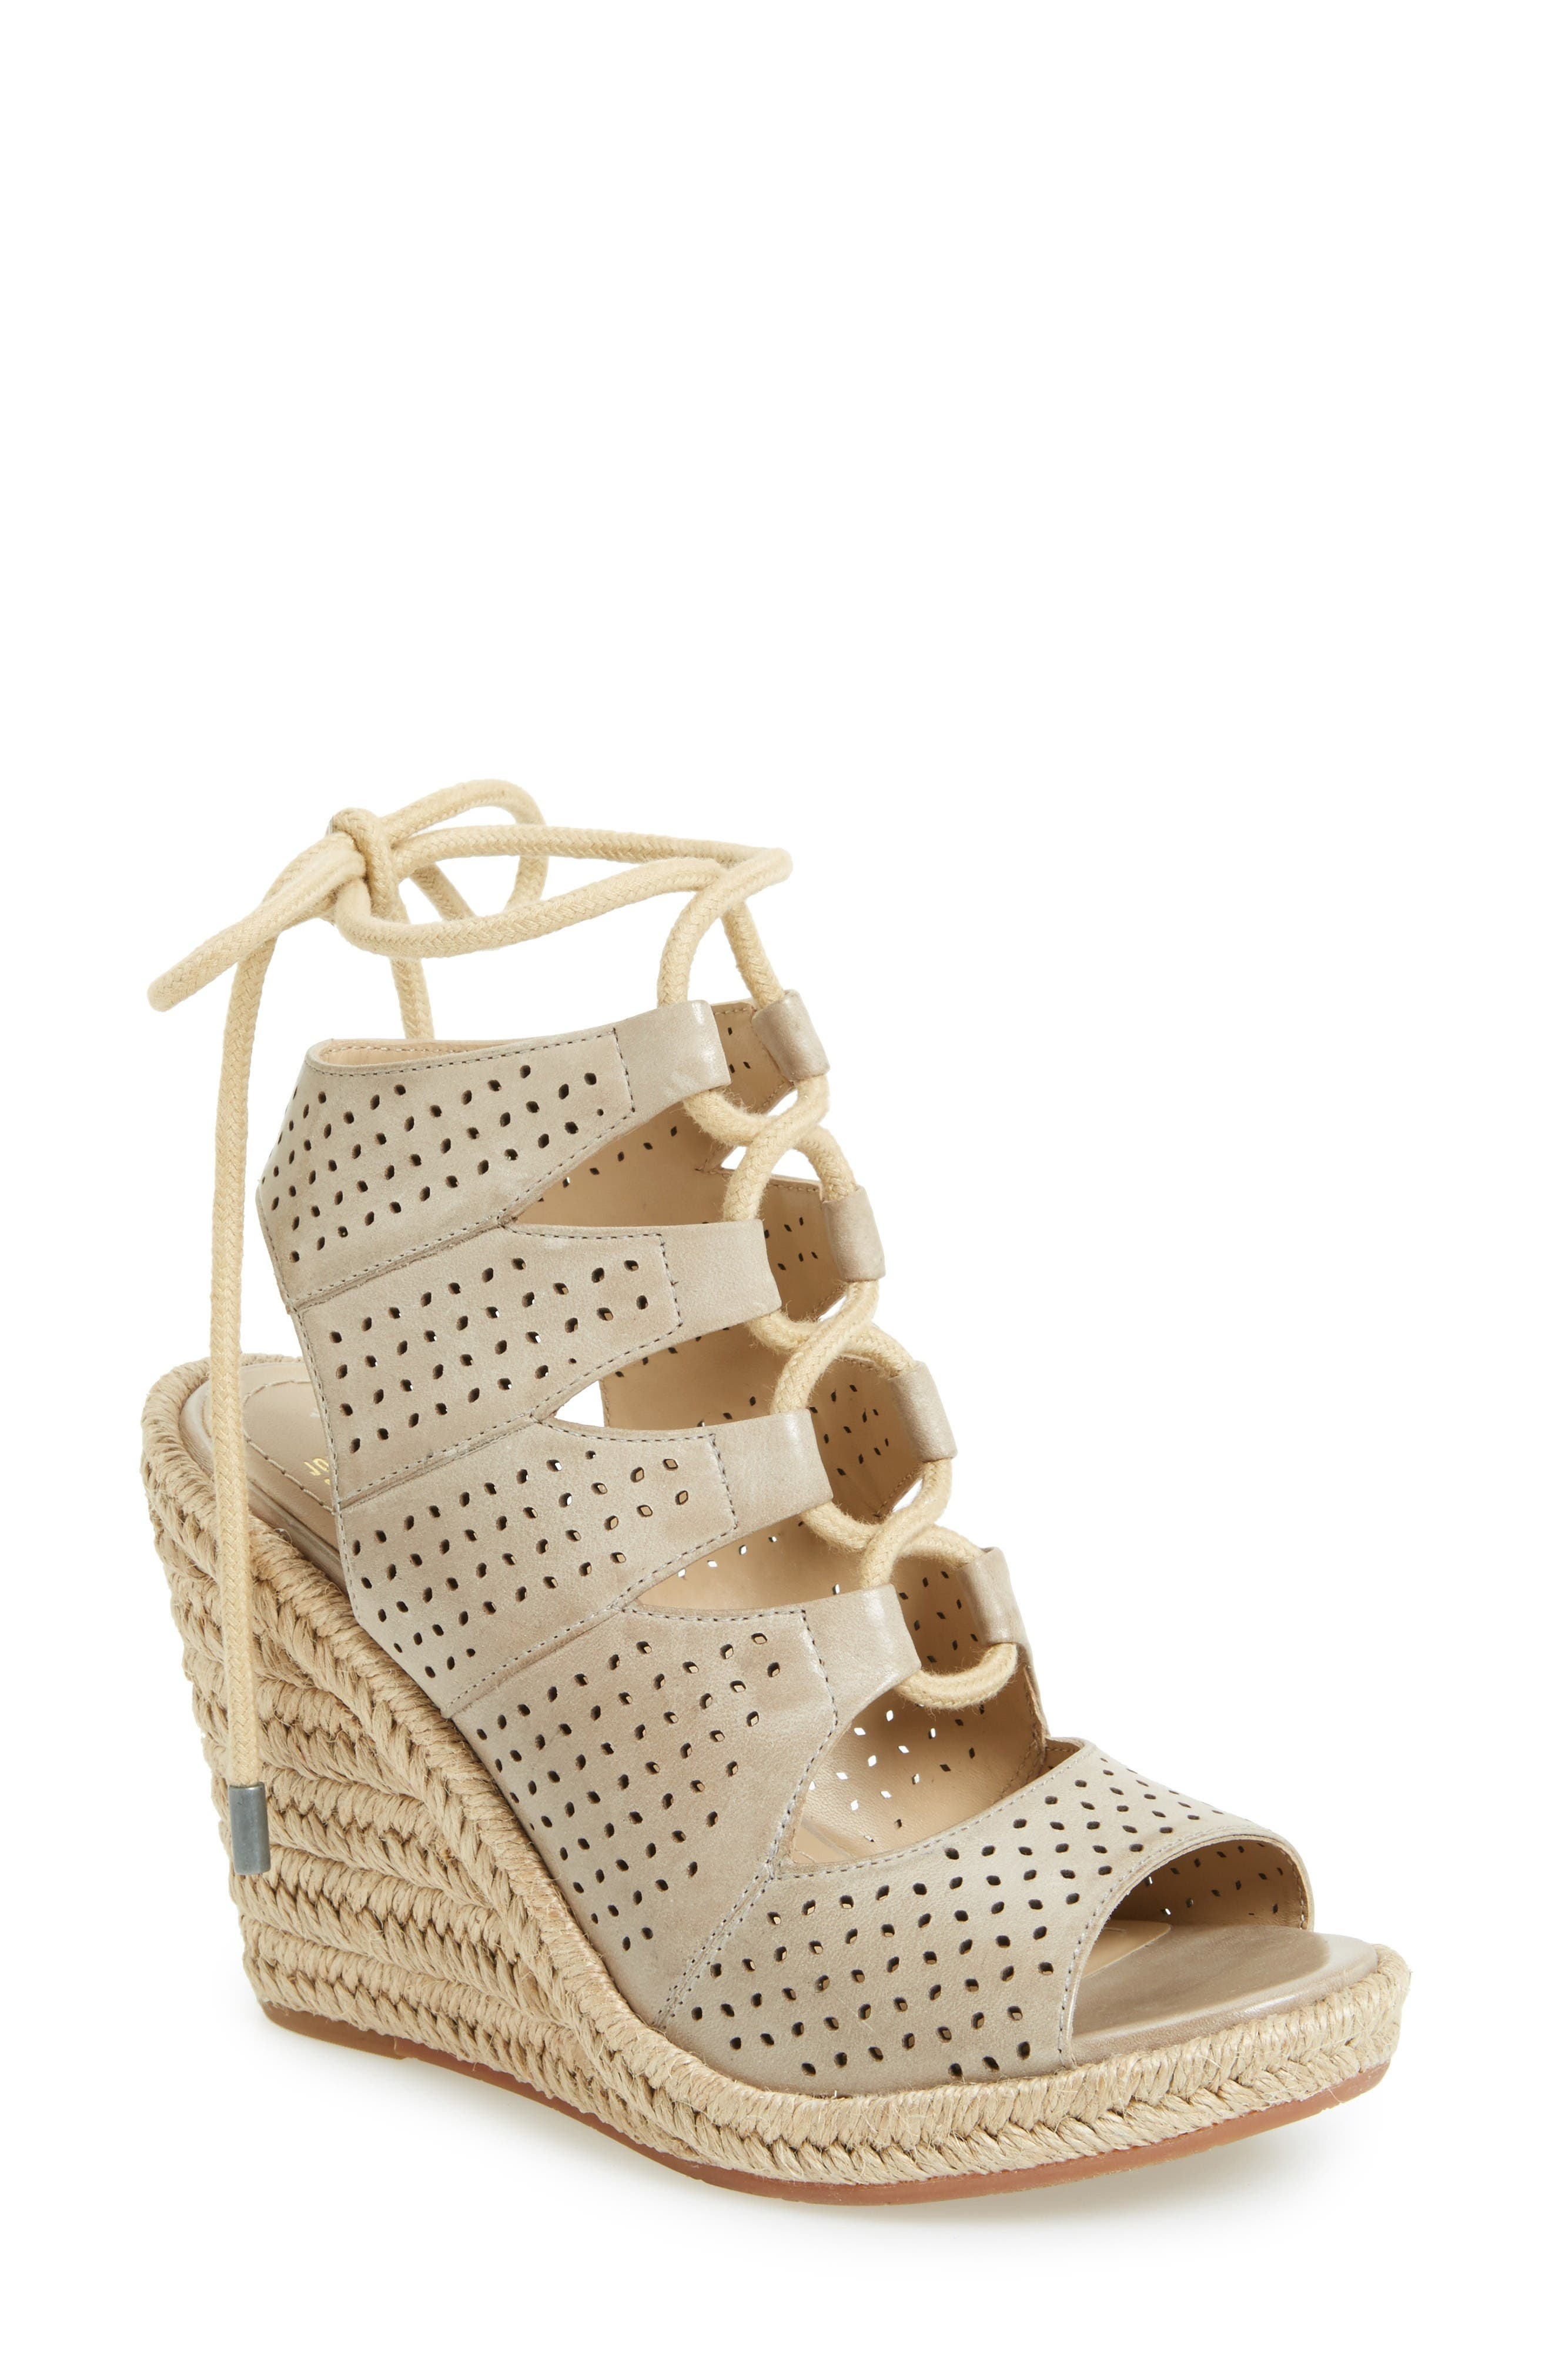 Johnston & Murphy Mandy Perforated Wedge Sandal (Women)